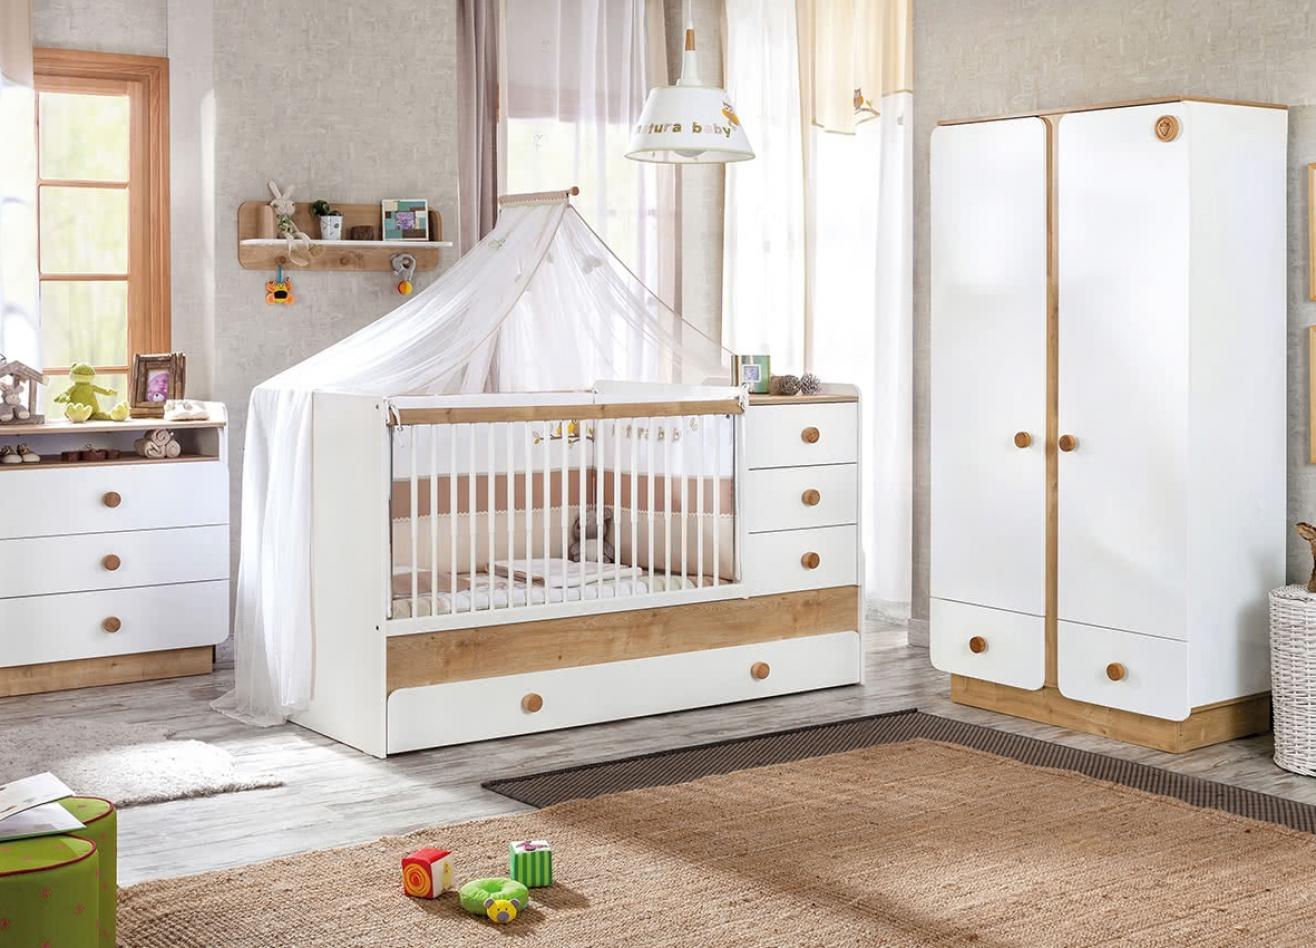 Коллекция детской мебели Natura Baby